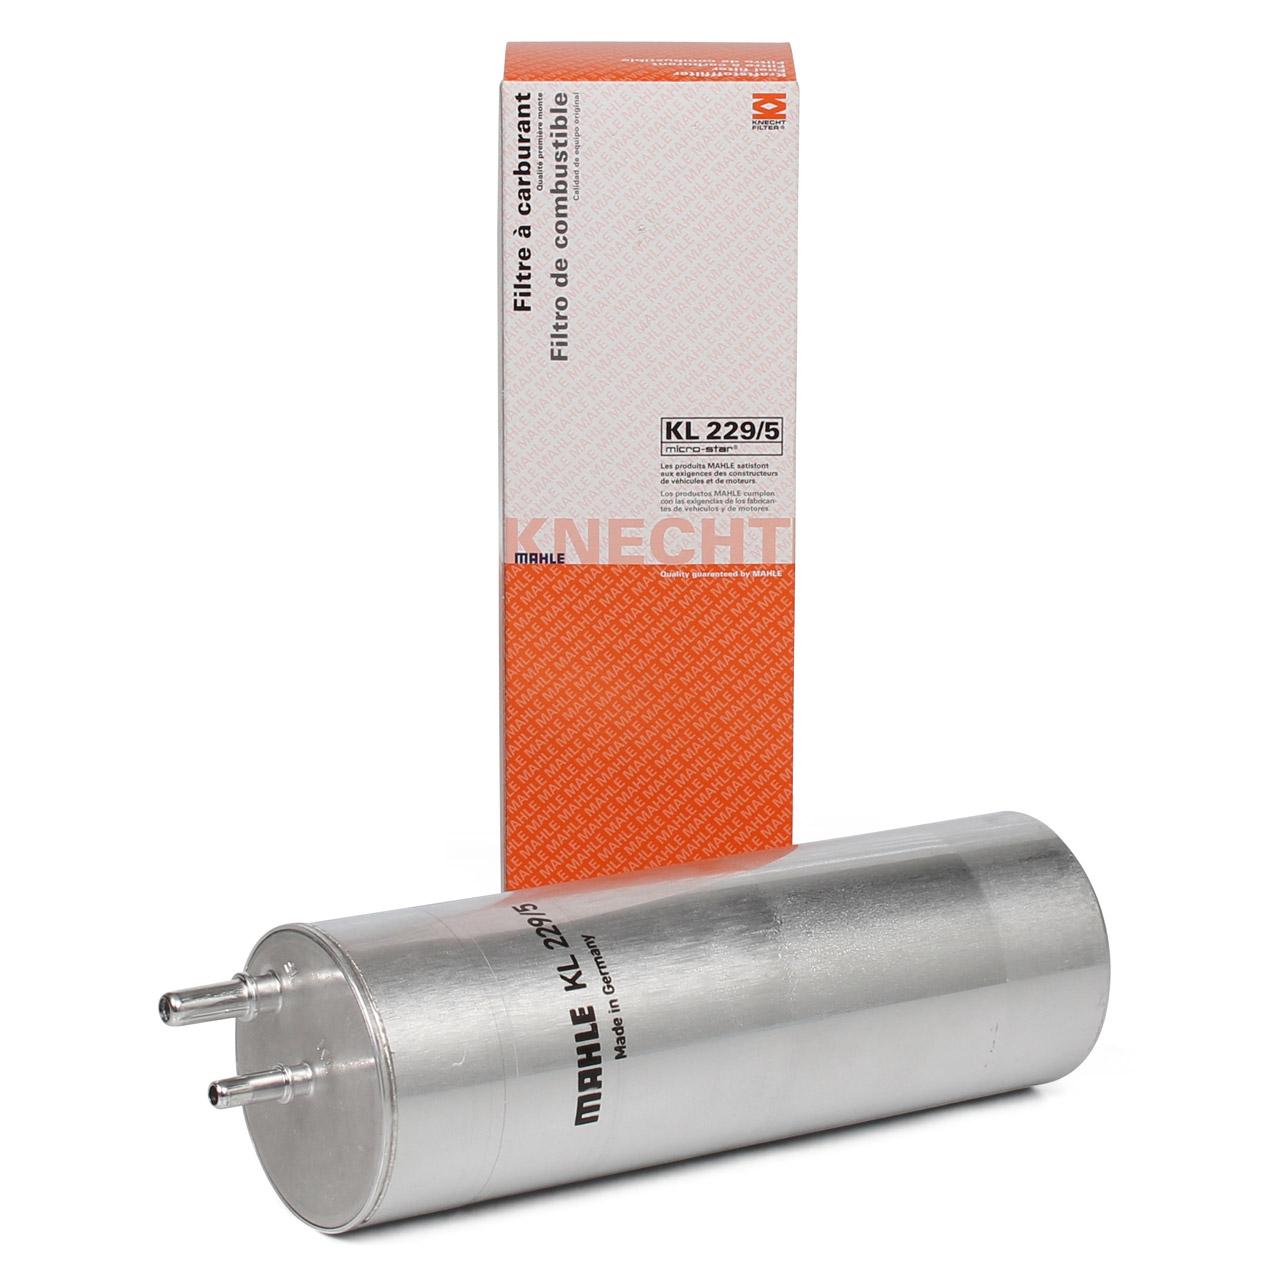 MAHLE Kraftstofffilter Dieselfilter für VW TRANSPORTER T5 2.5 TDI T6 2.0 TDI